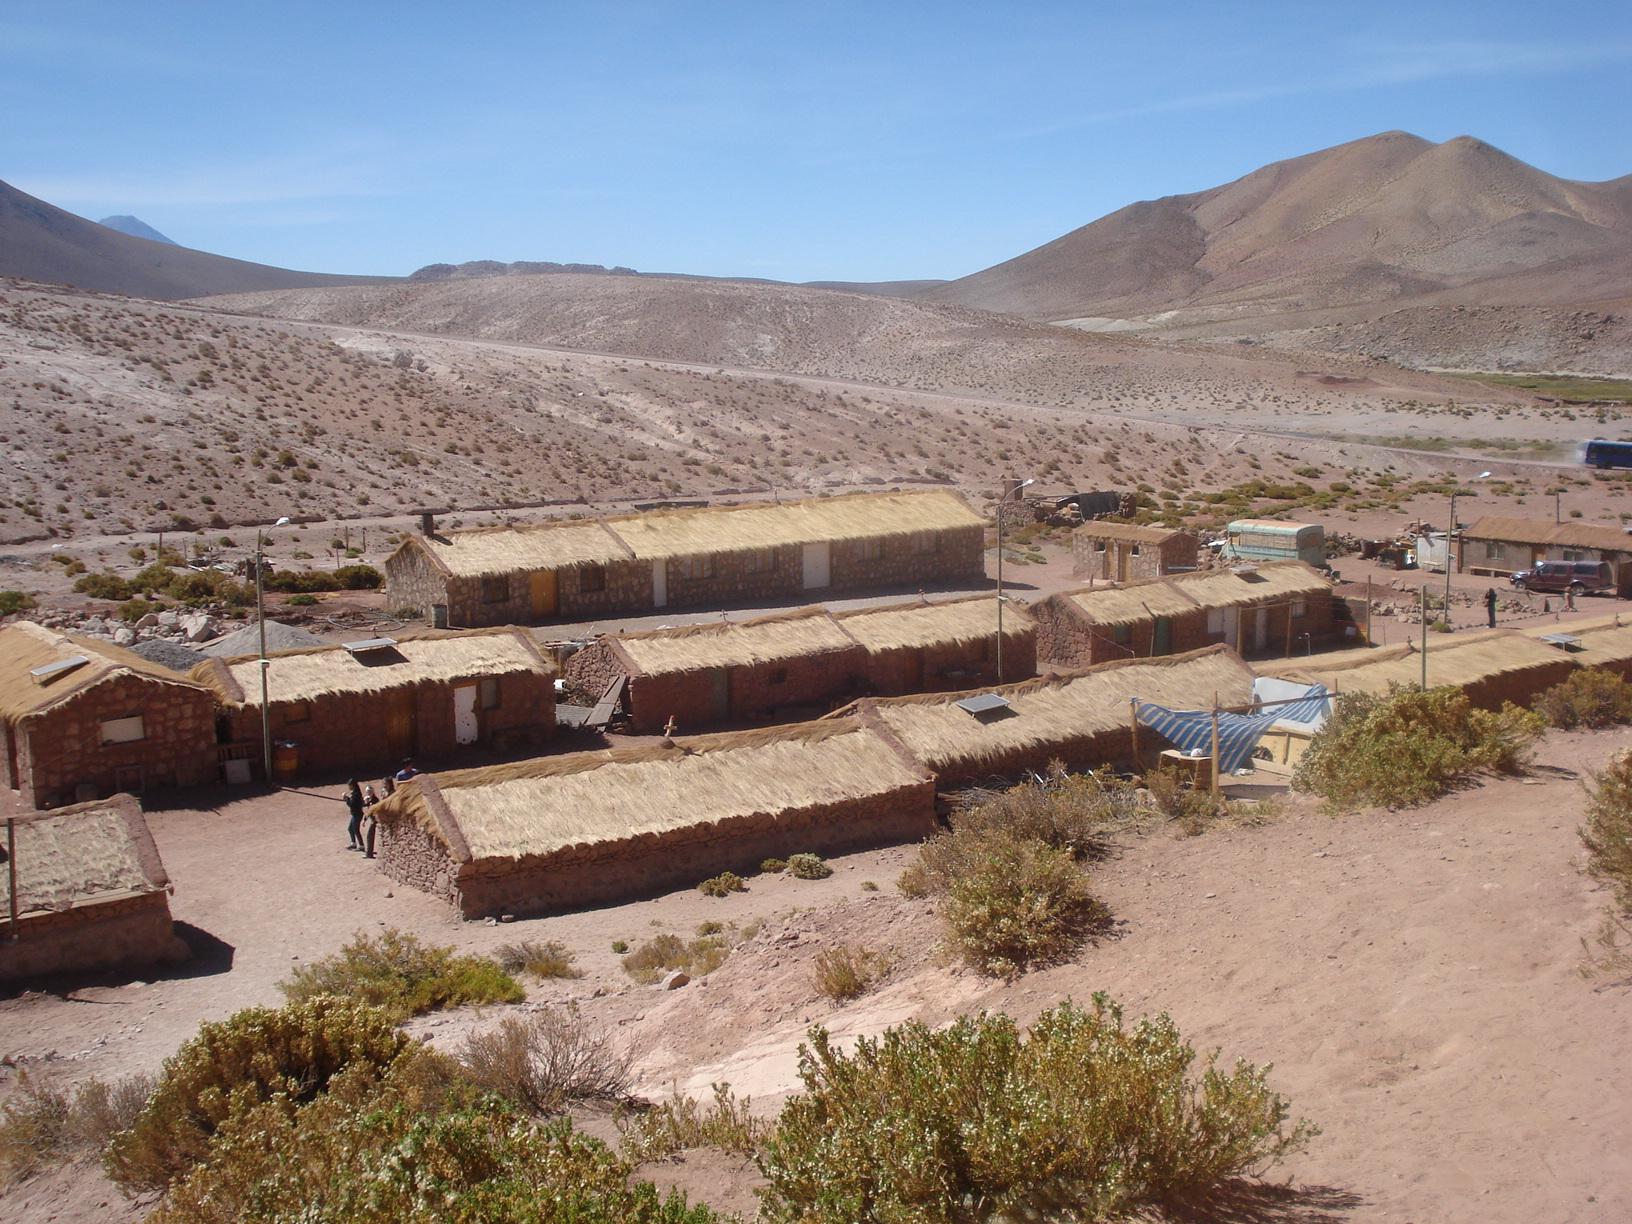 Pequeno povoado que vive no meio do deserto do Atacama, Chile